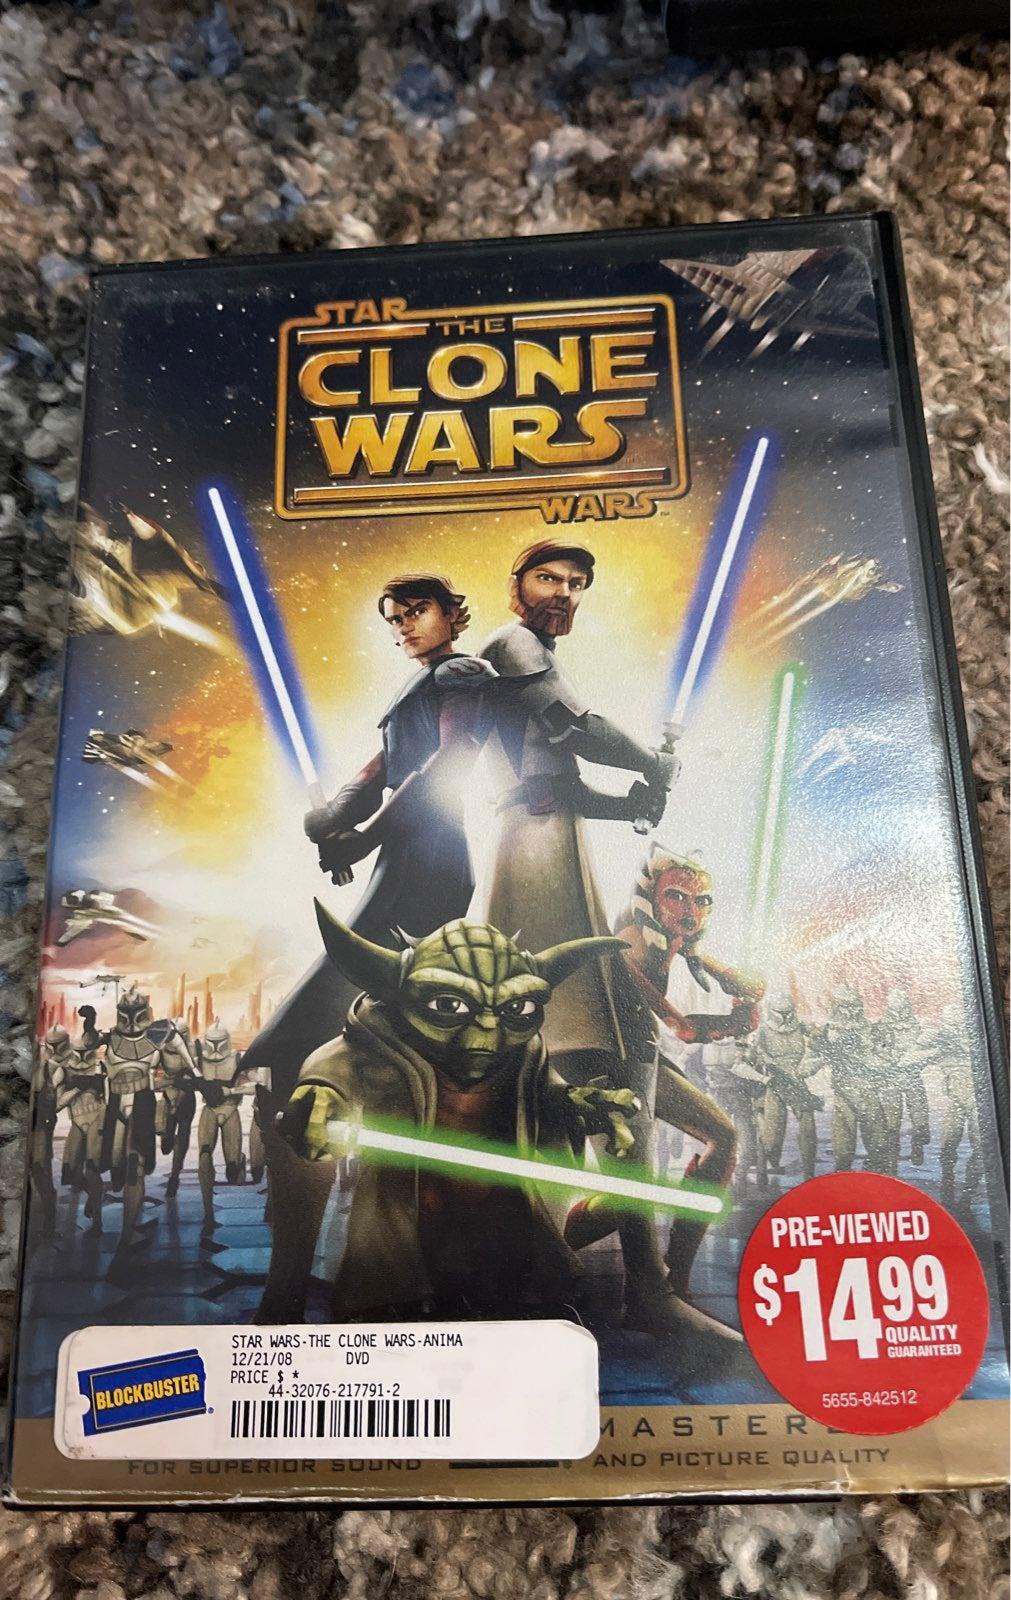 The clone wars dvd